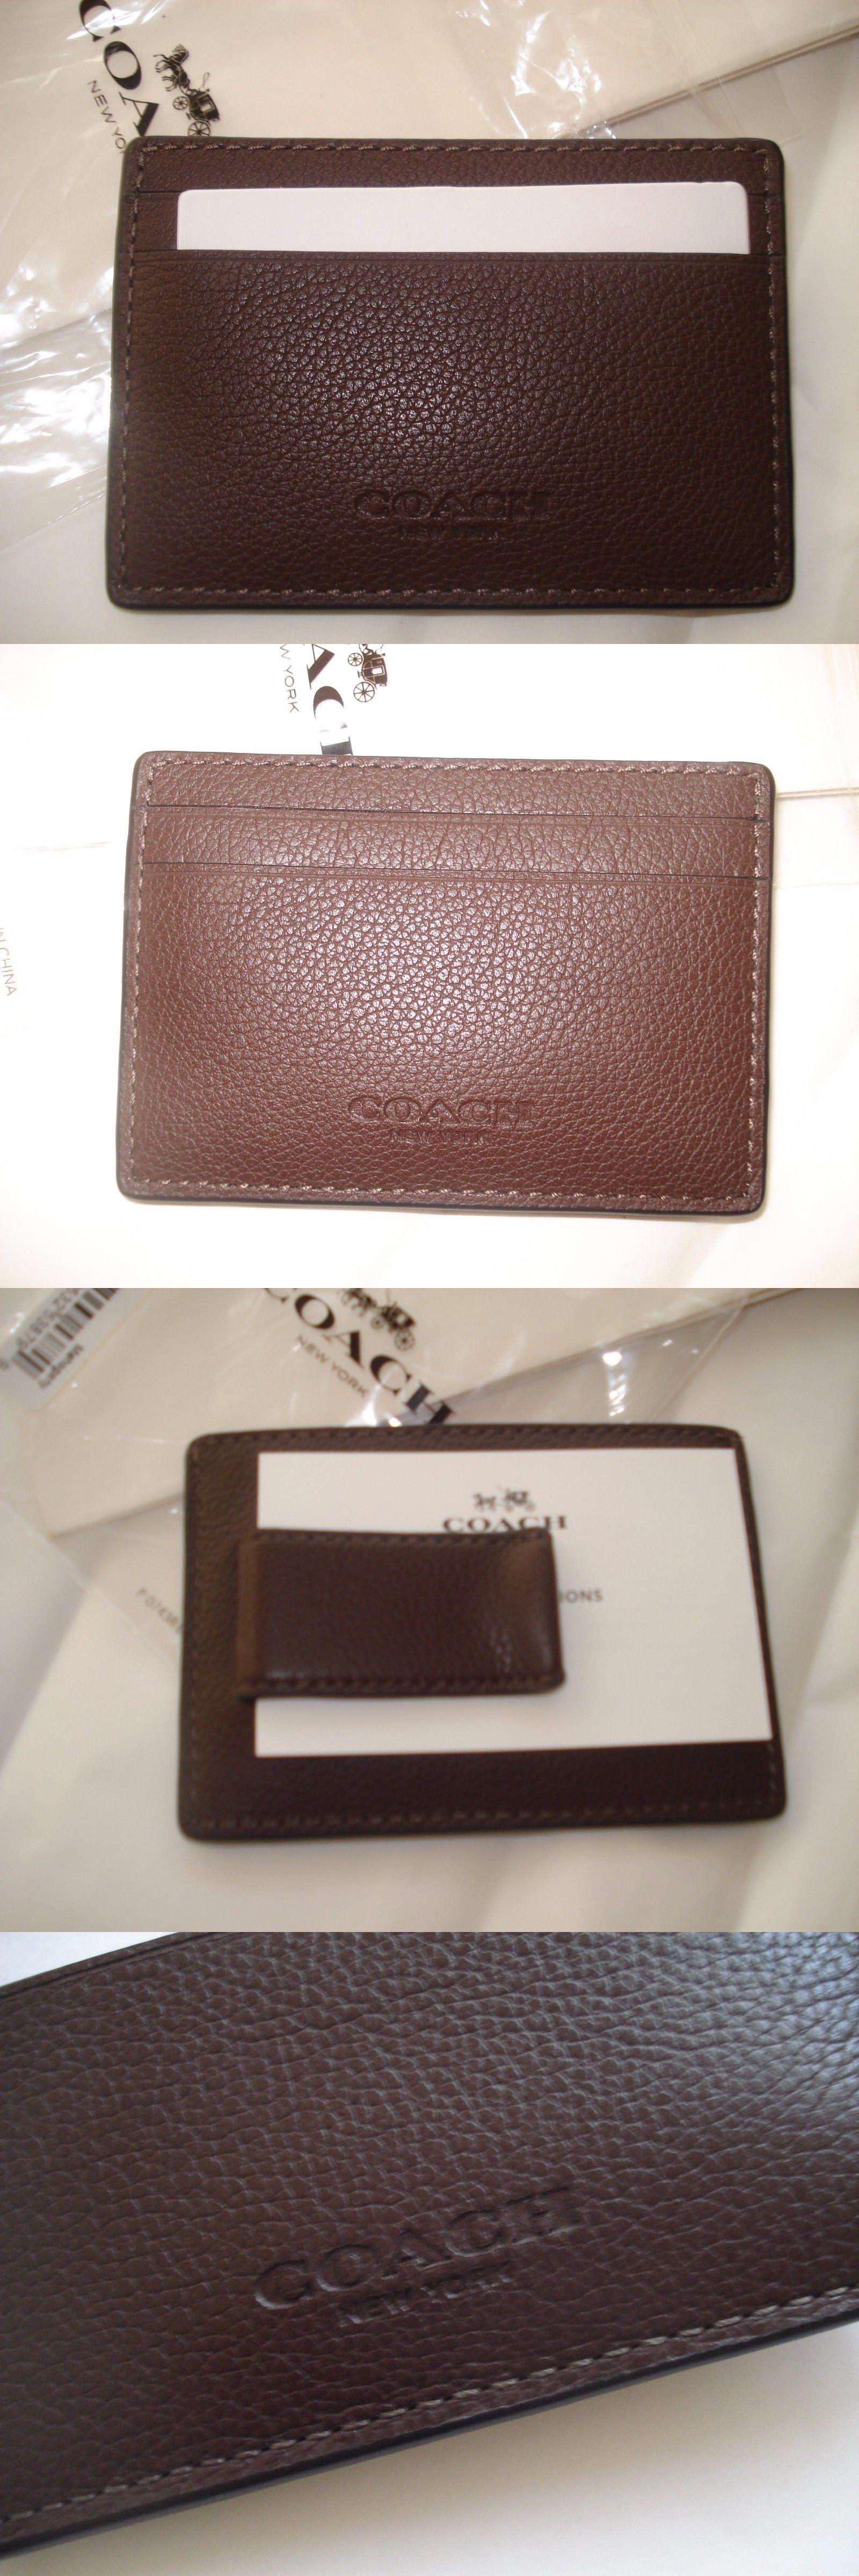 51177790 Wallets 2996: Nwt Coach Men S Leather Slim Money Clip Credit Card ...